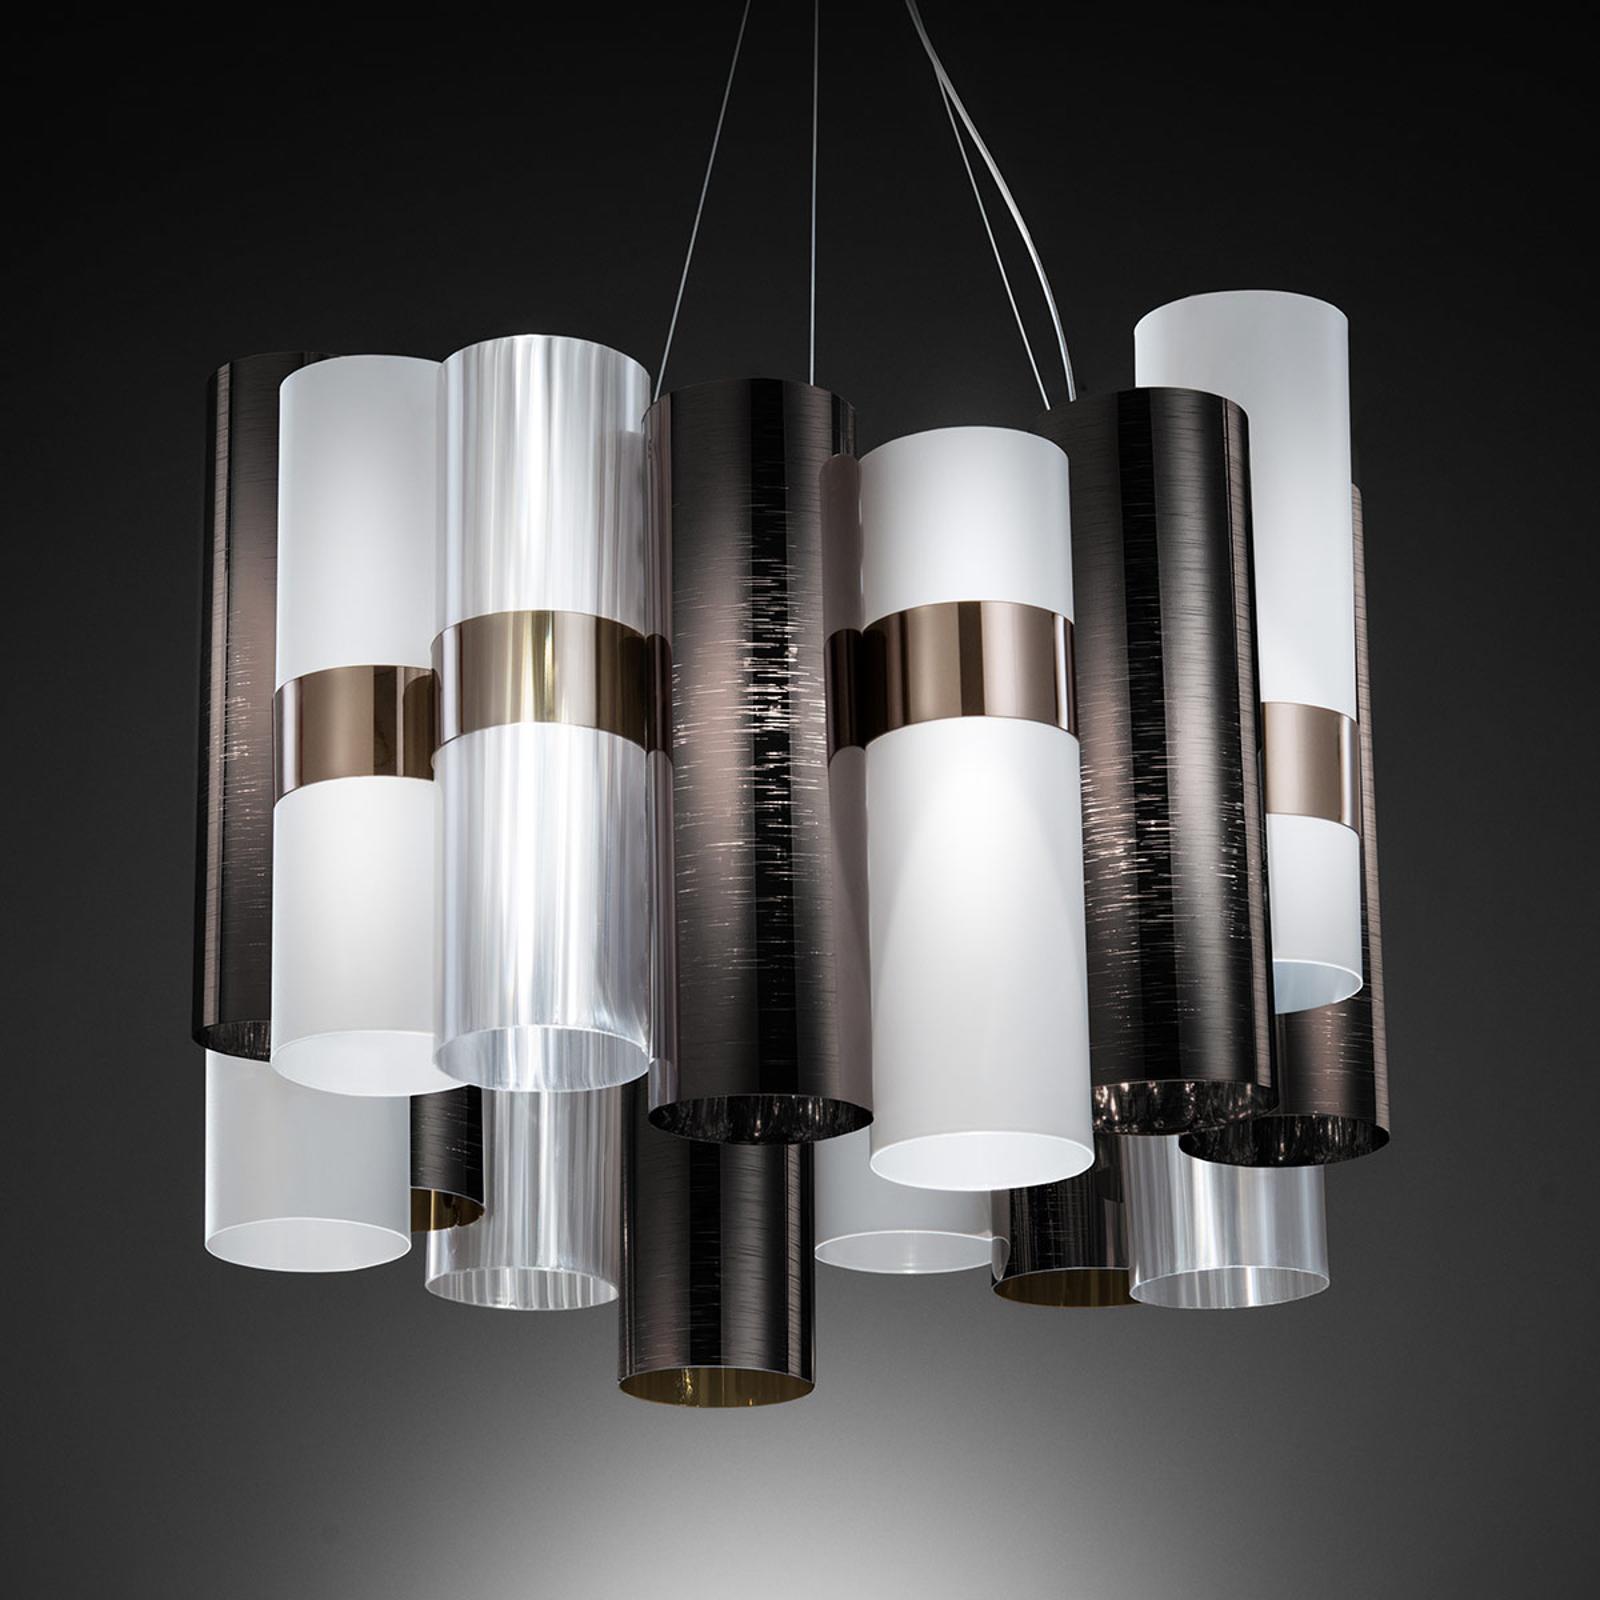 Stilfull LED-designerlampe La Lollo